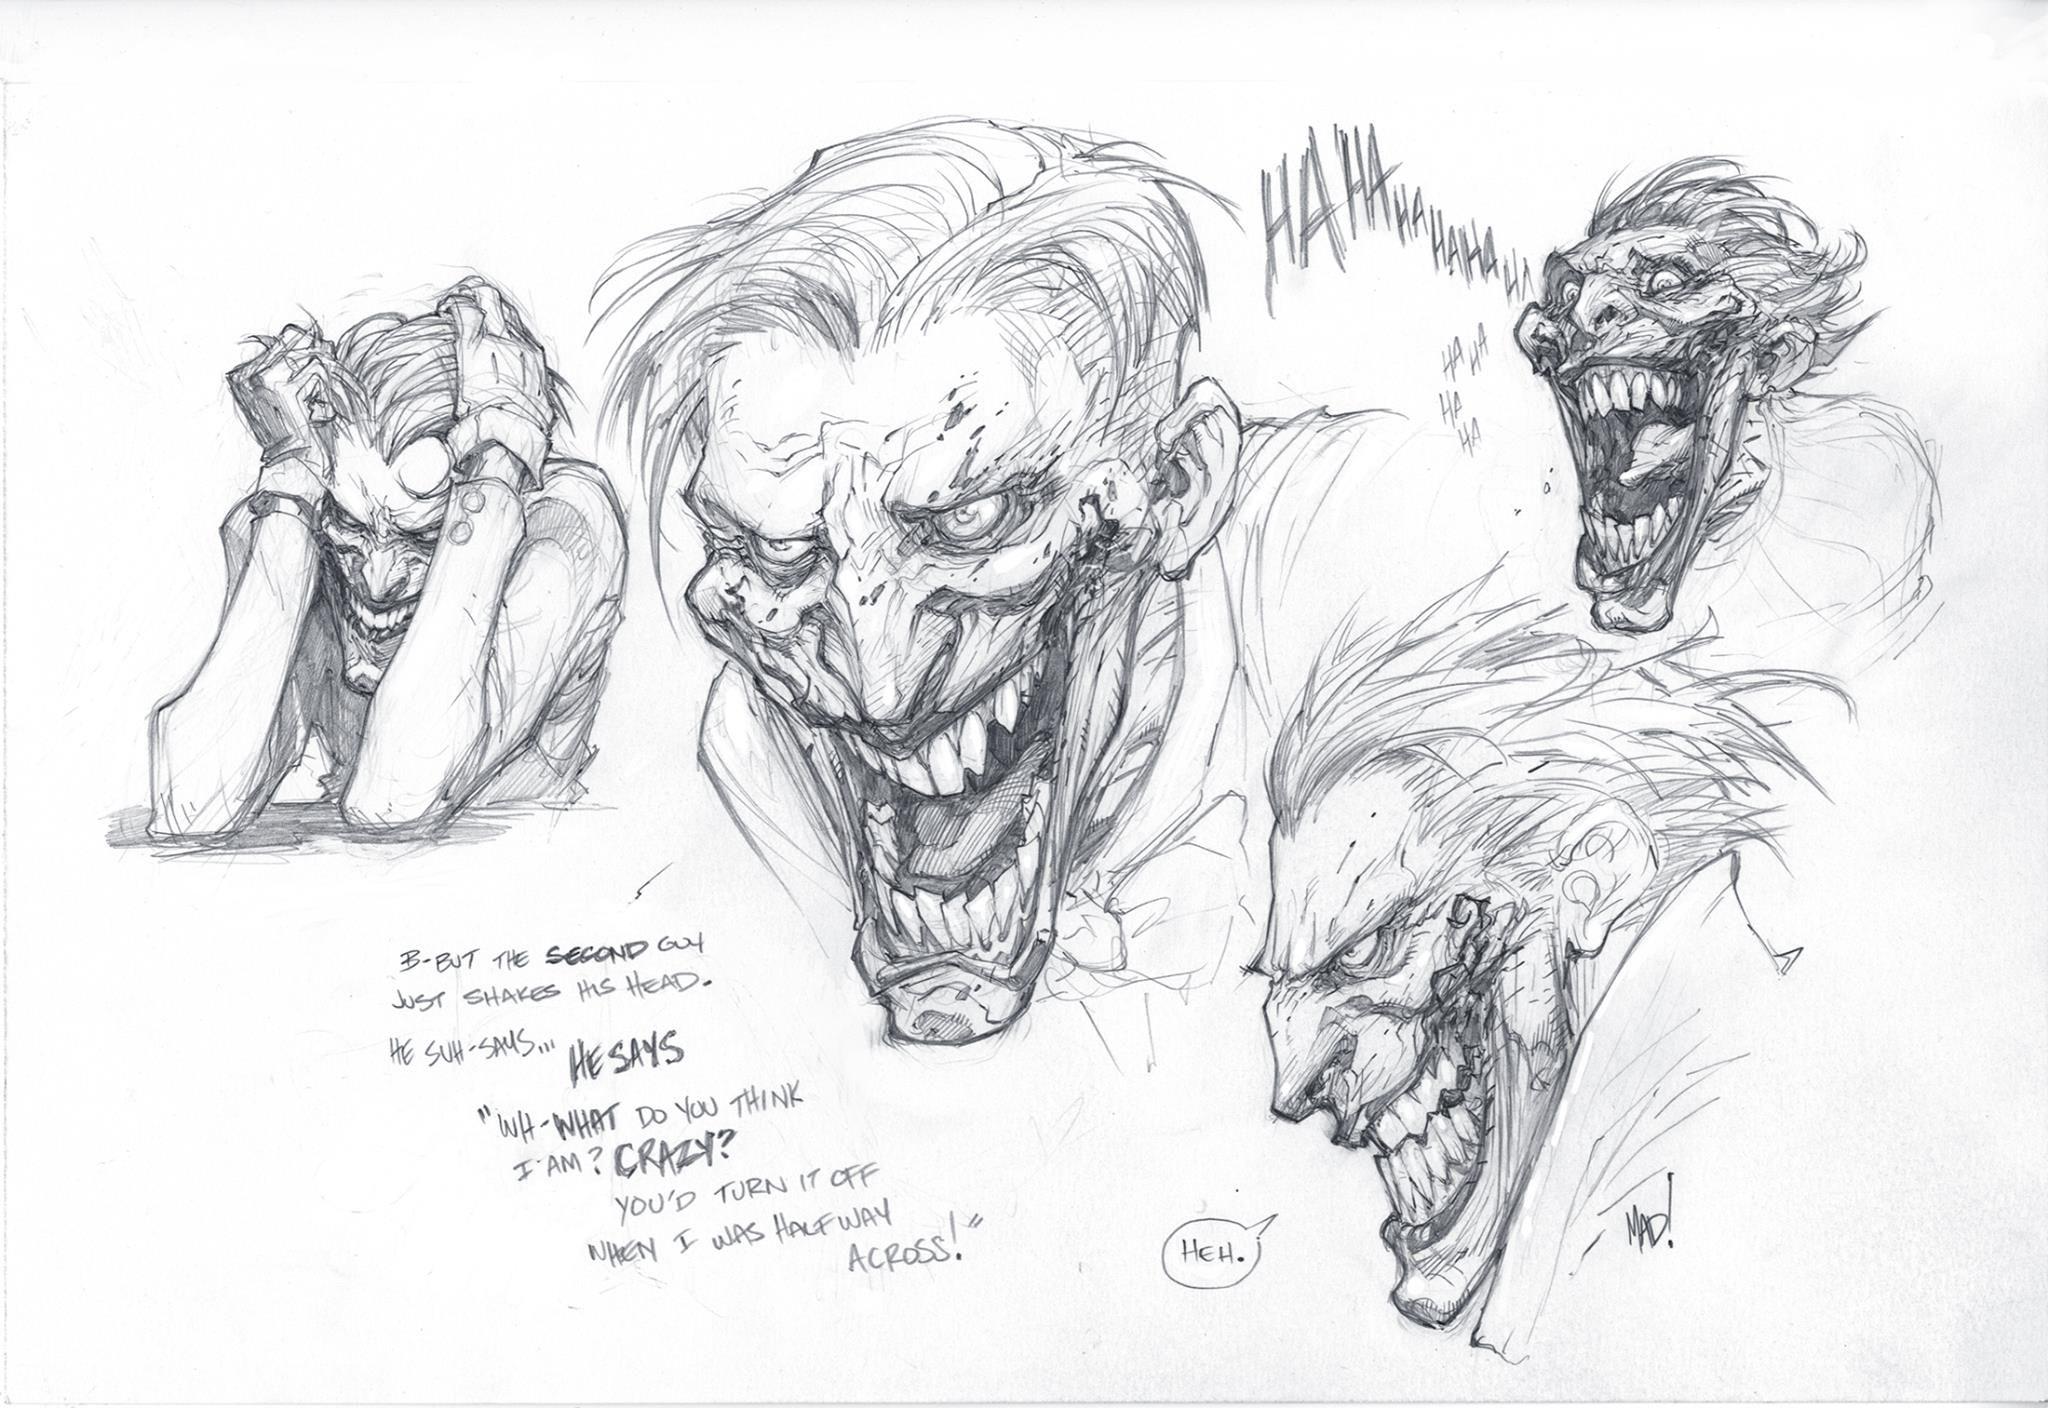 Joe Mad's warm-up of the Joker